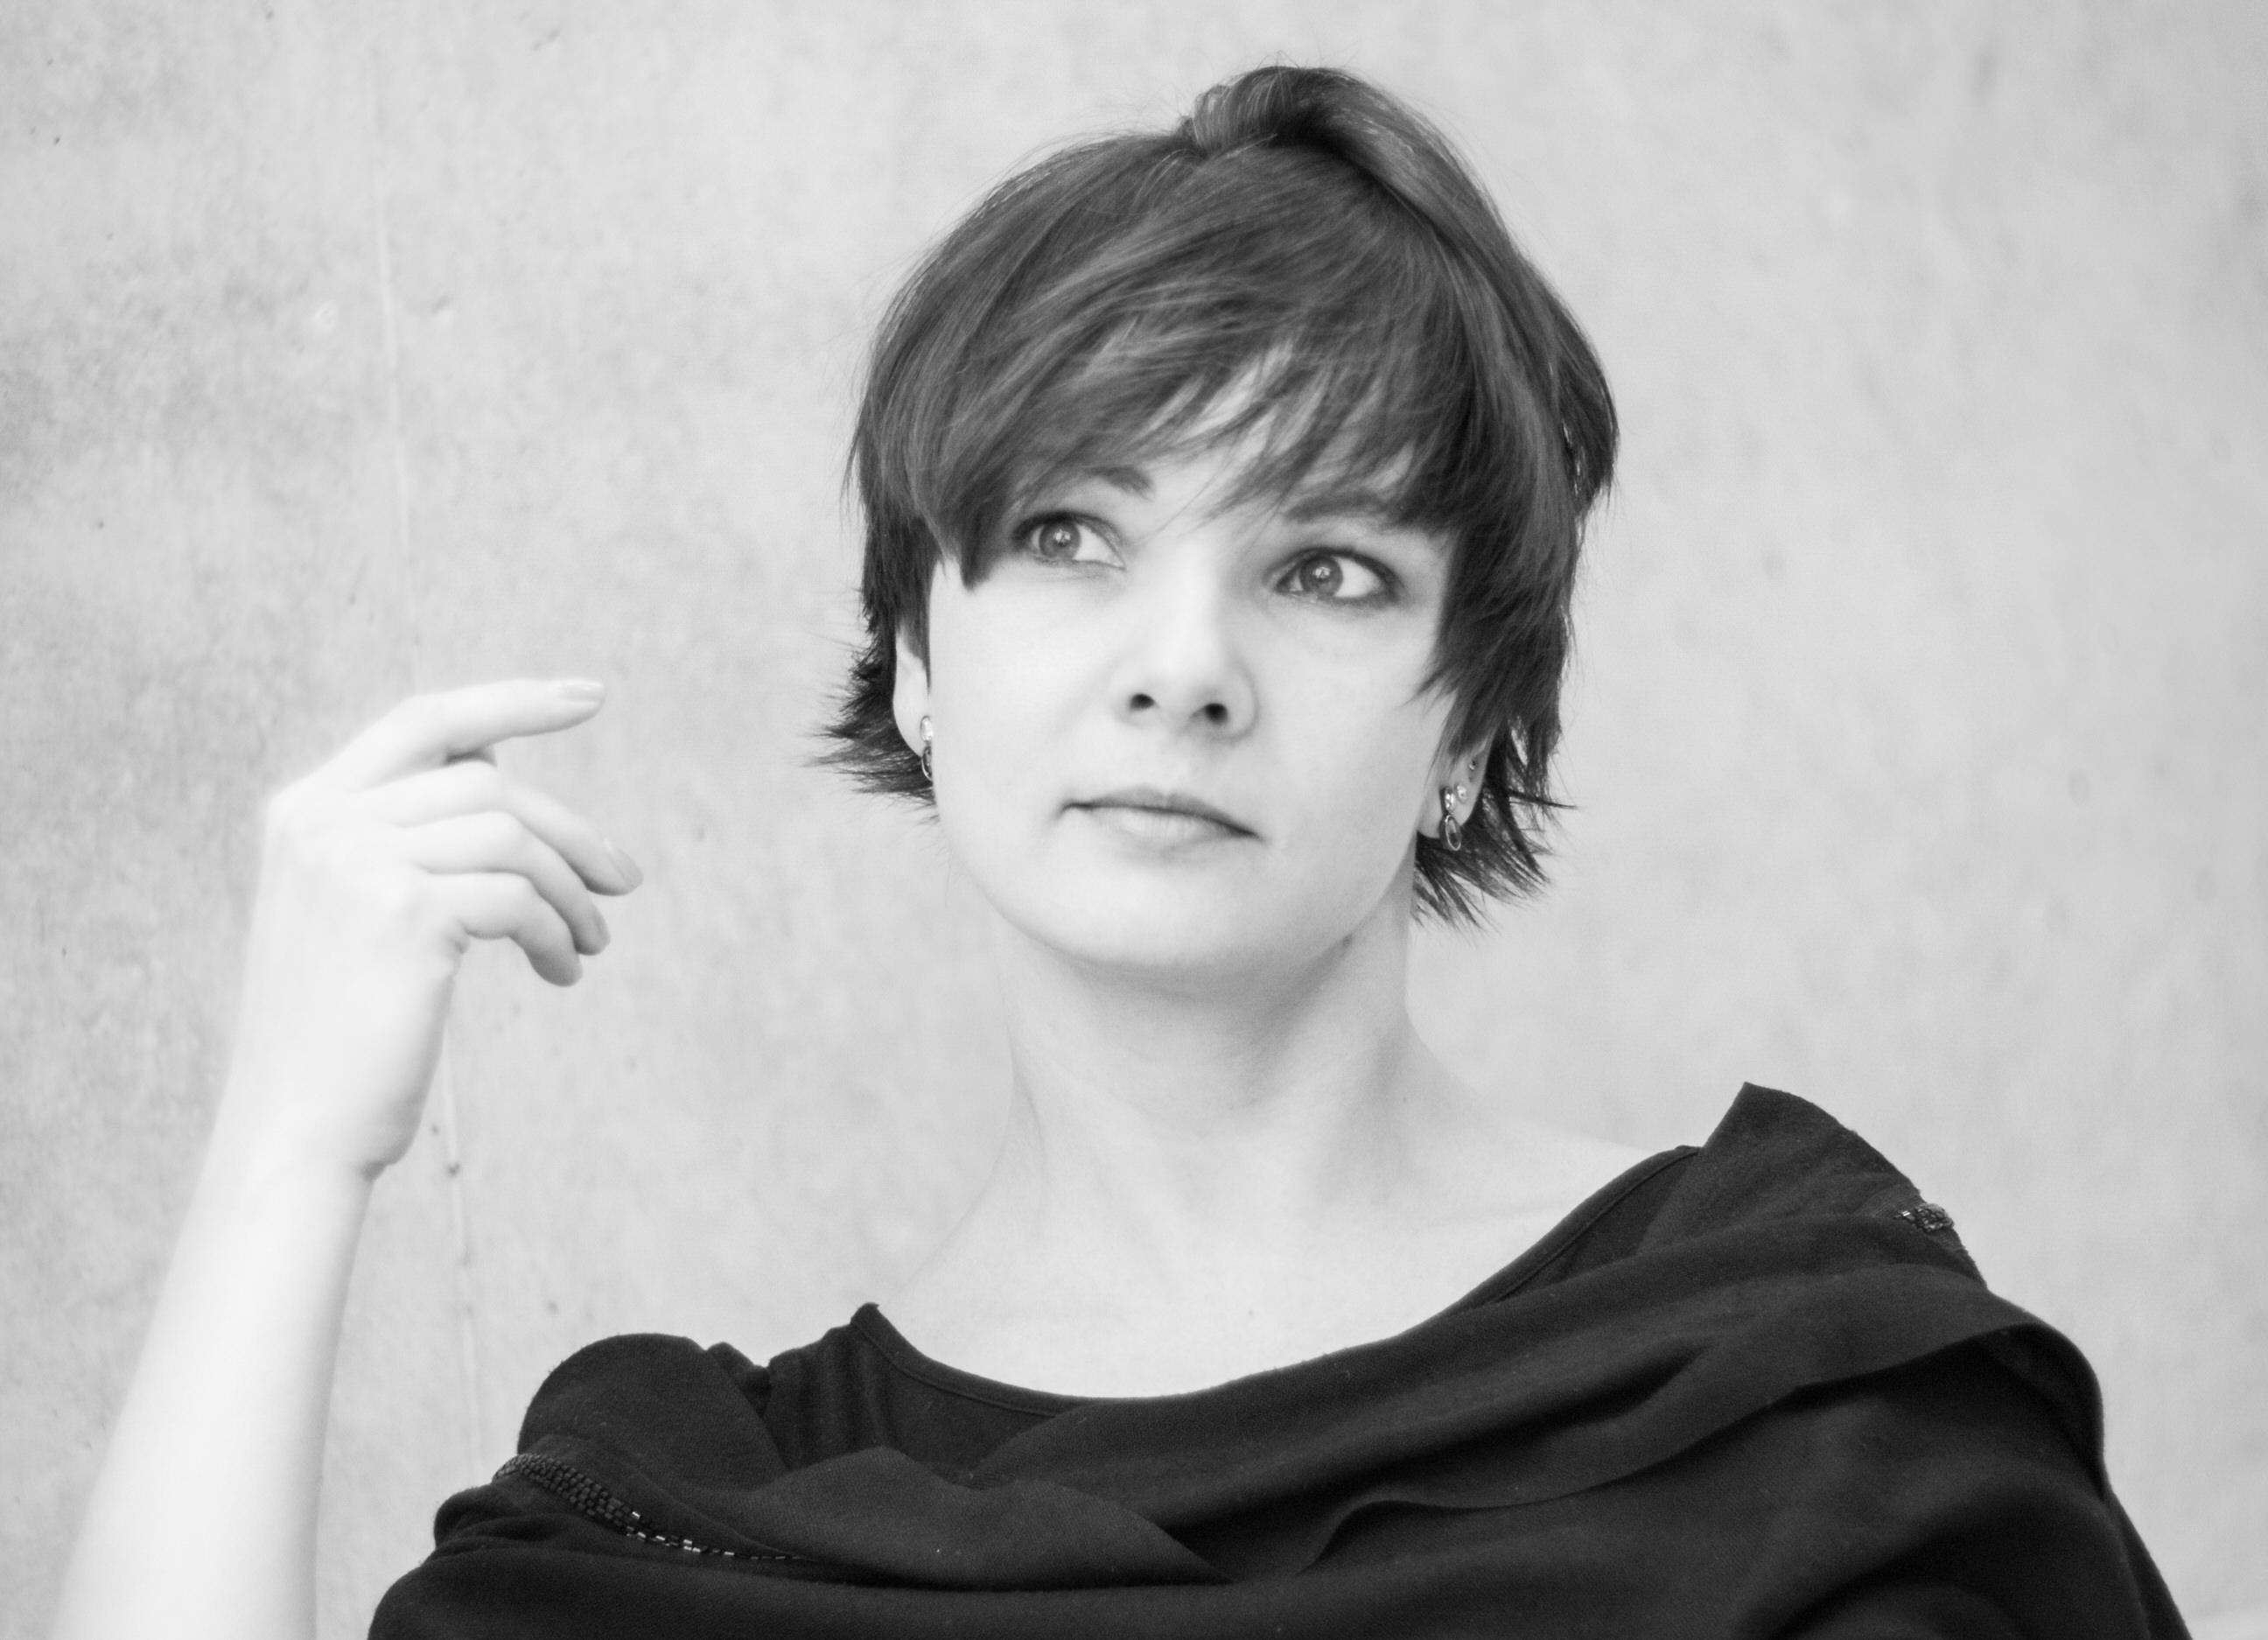 DDP Personal Trainer Dresden & Tanzschule Dresden Dörte Freitag HipHop Anzhelika Spektor Anna Pounok